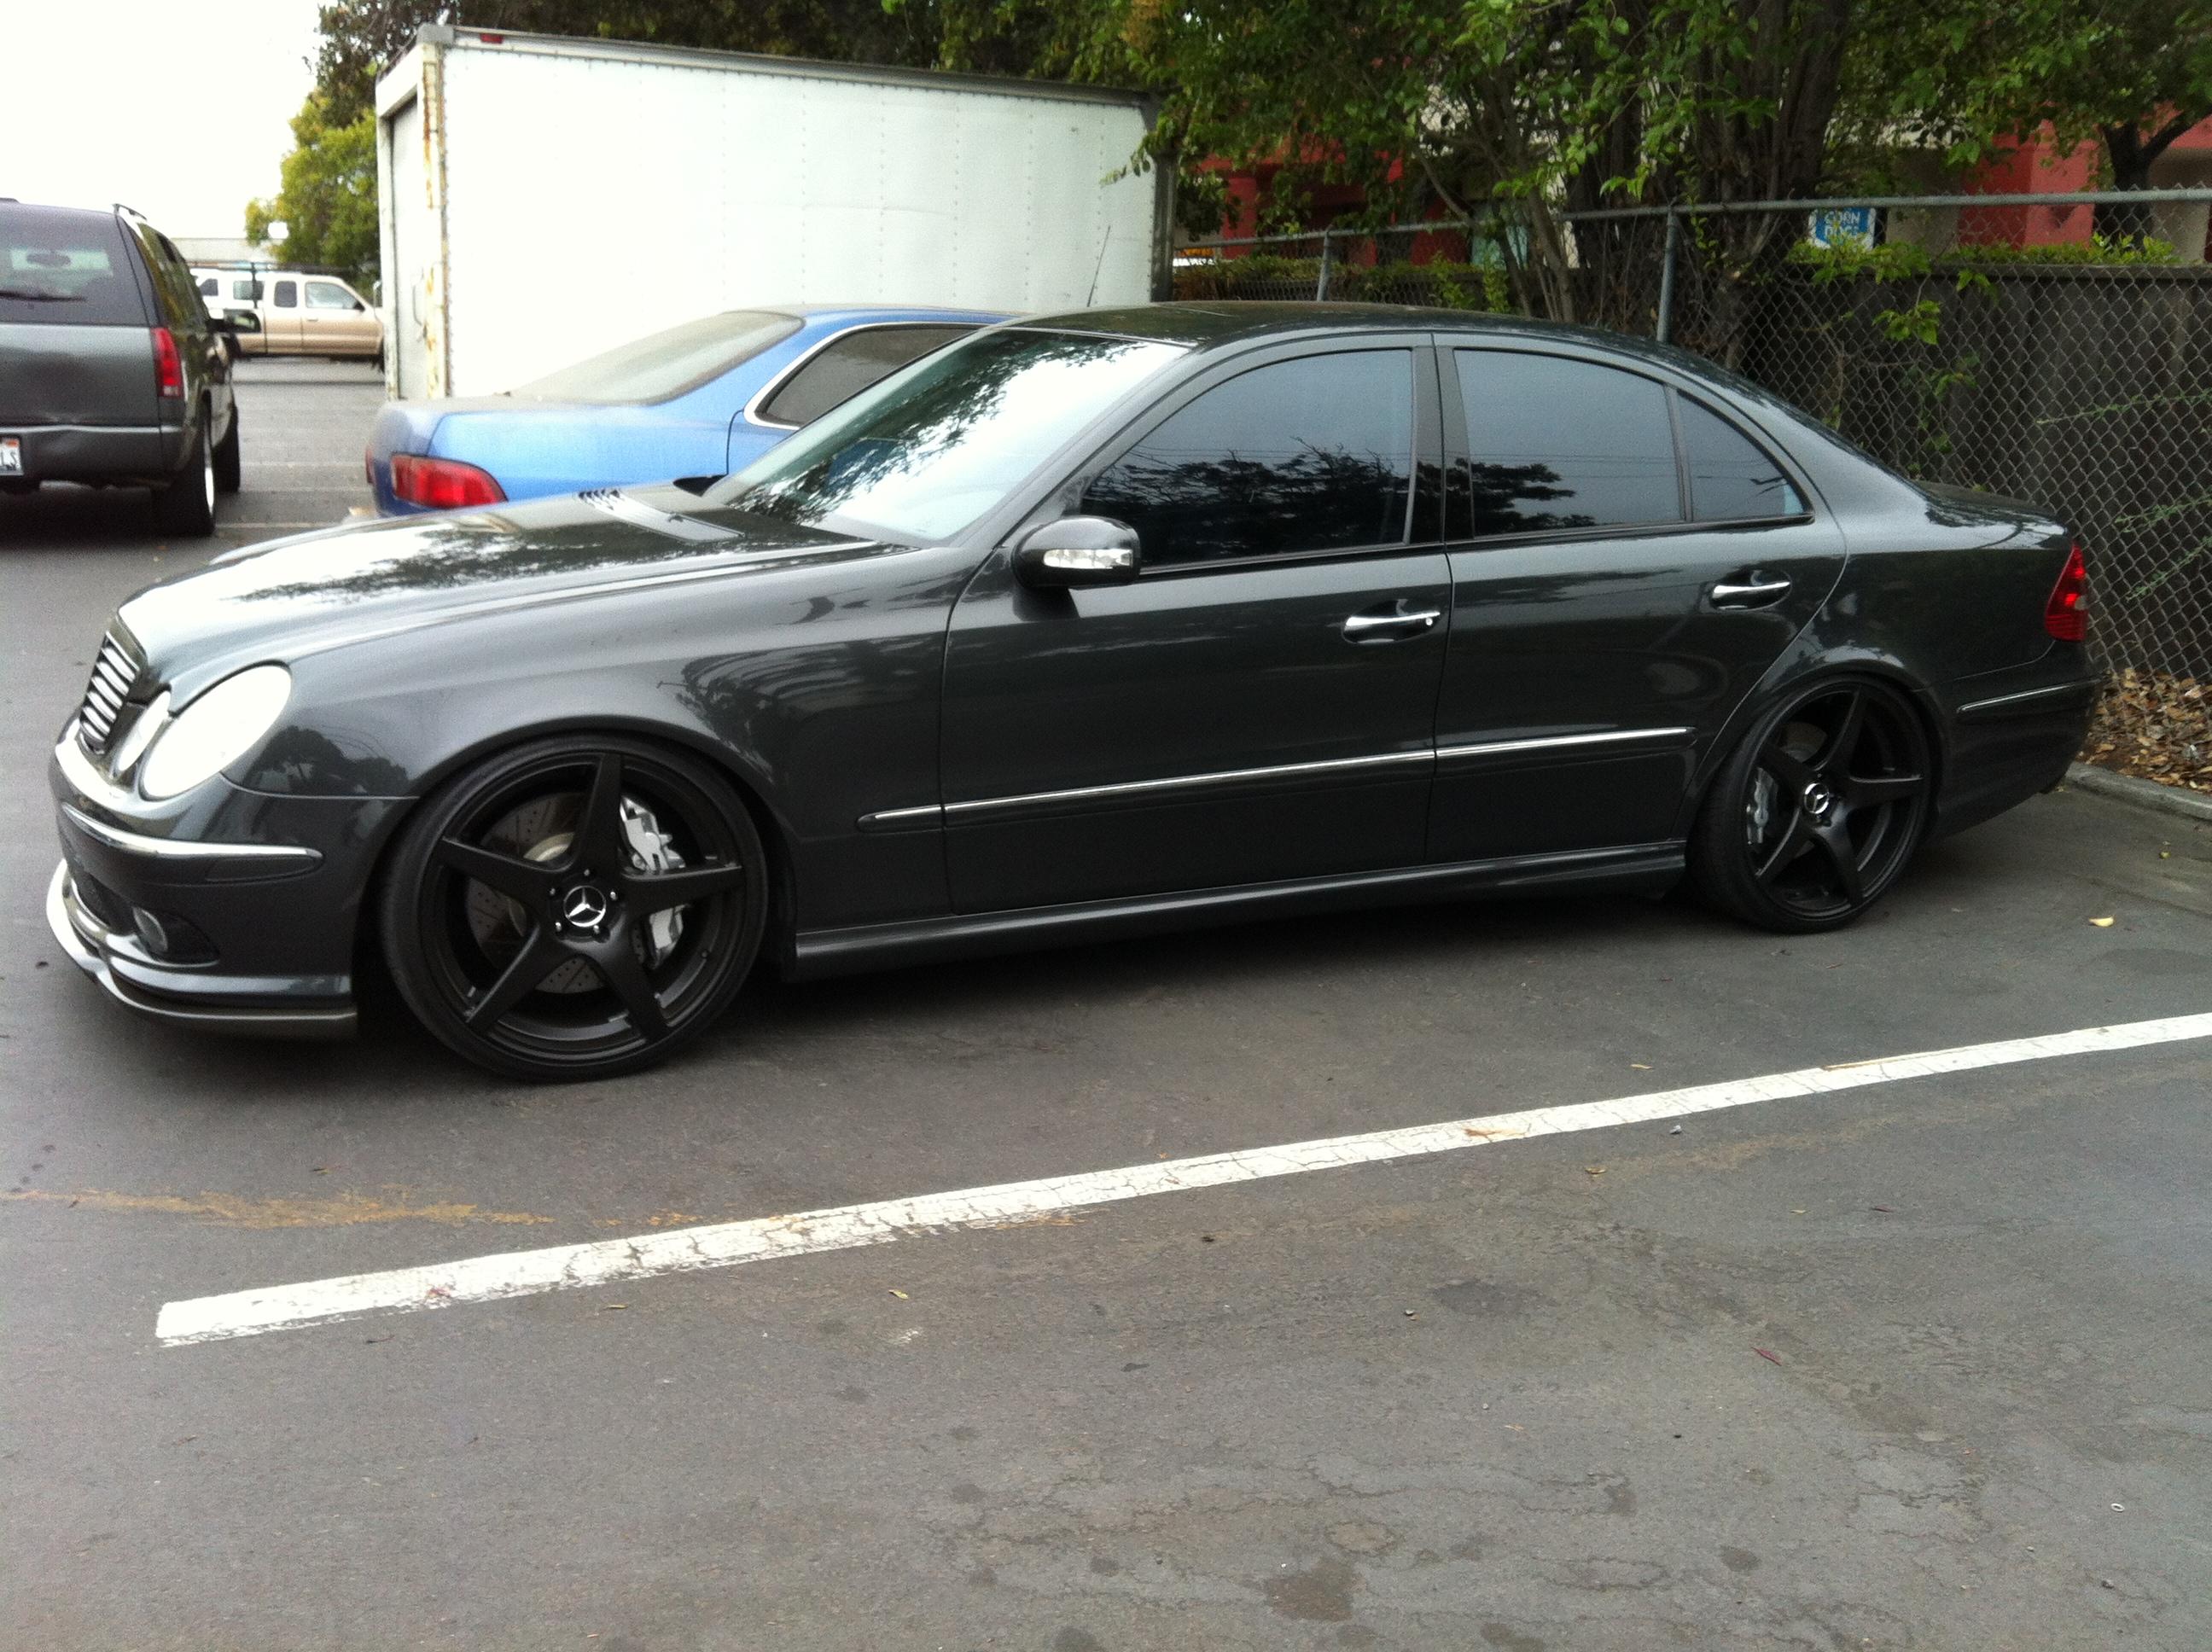 Mercedes Benz Amg E63 Gt 5 M133 Gallery Mht Wheels Inc